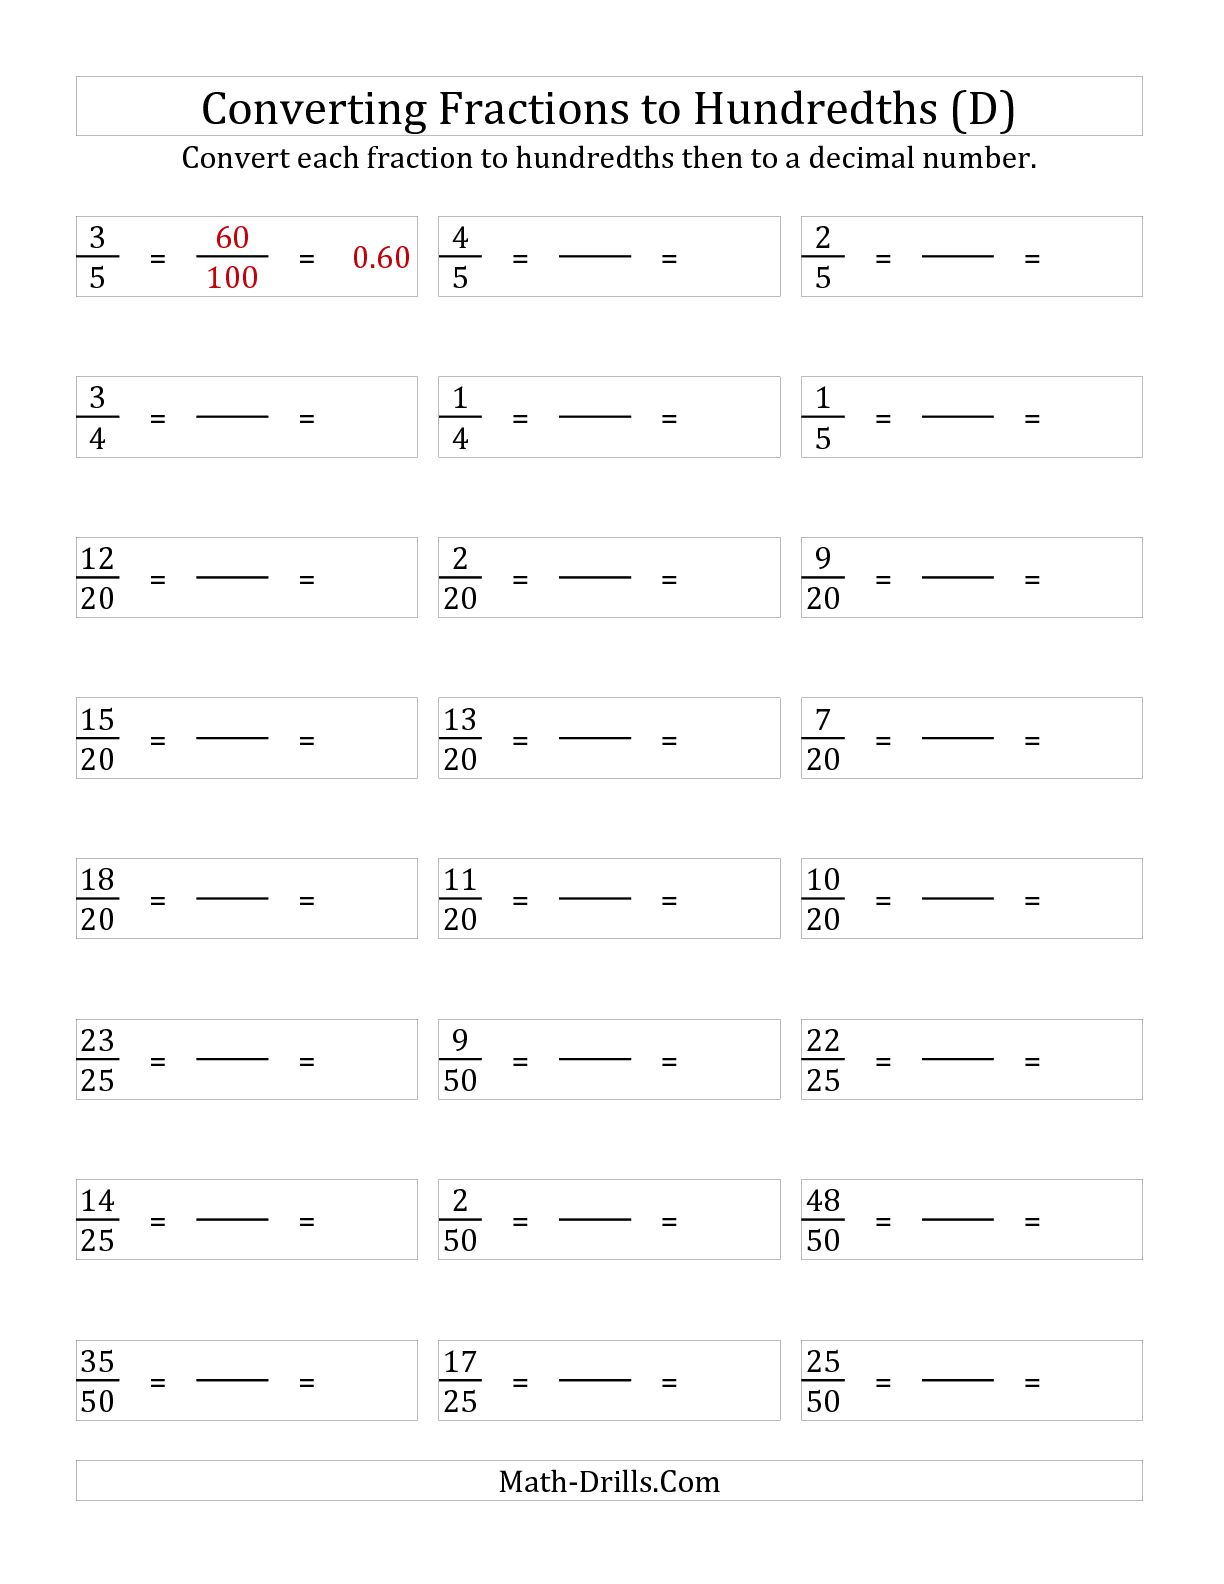 Convert Fractions To Decimals Worksheet : Cmediadrivers | Convert Fractions To Decimals Worksheets Free Printable